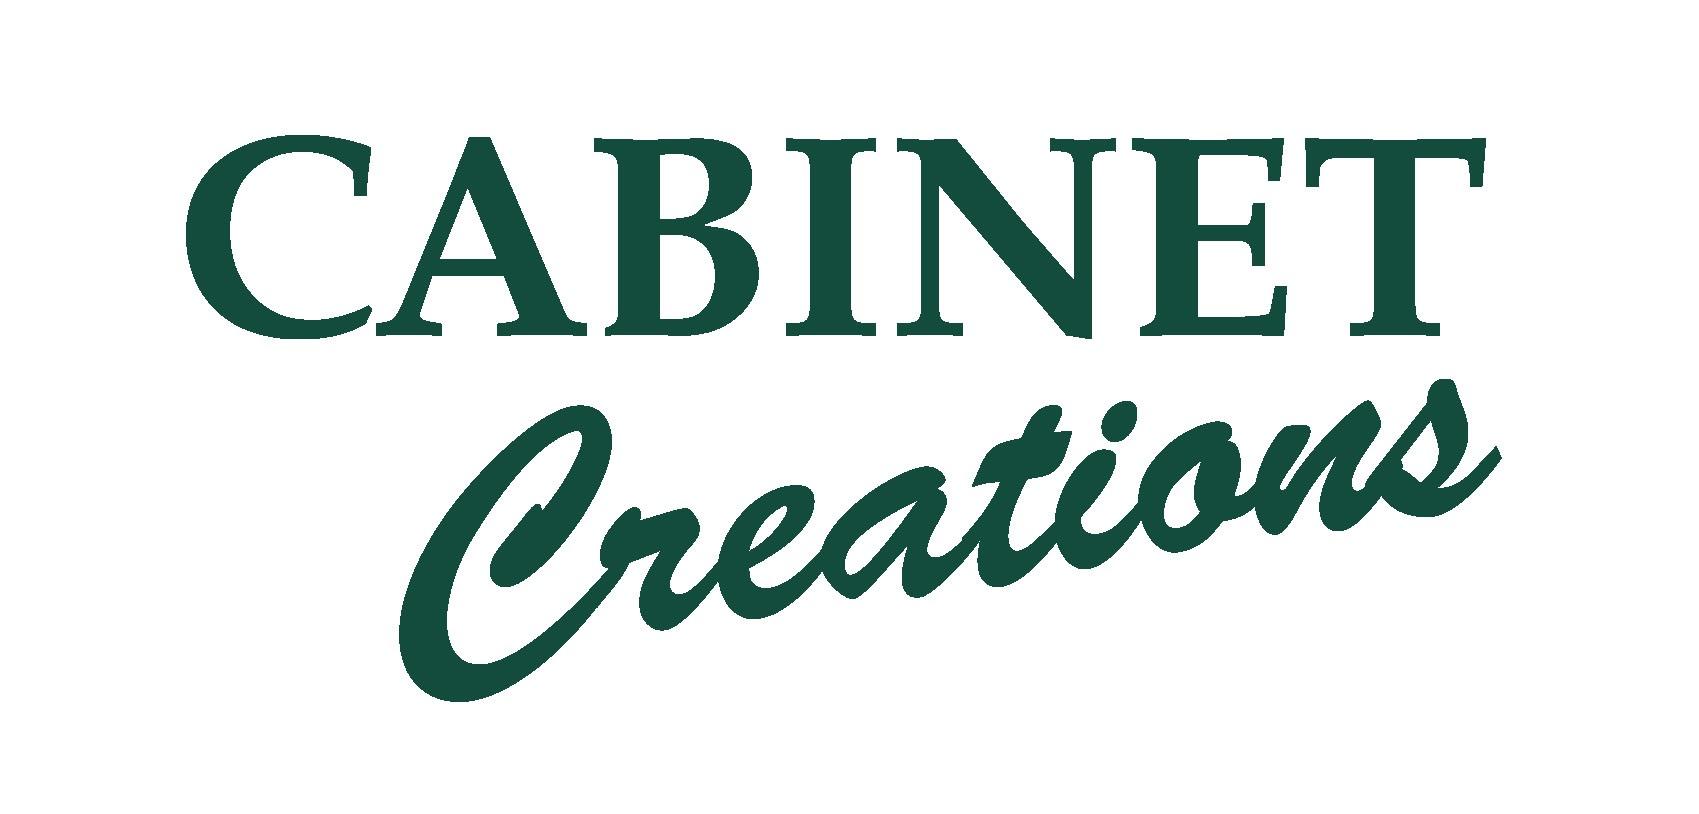 Cabinet Creations Logo 2